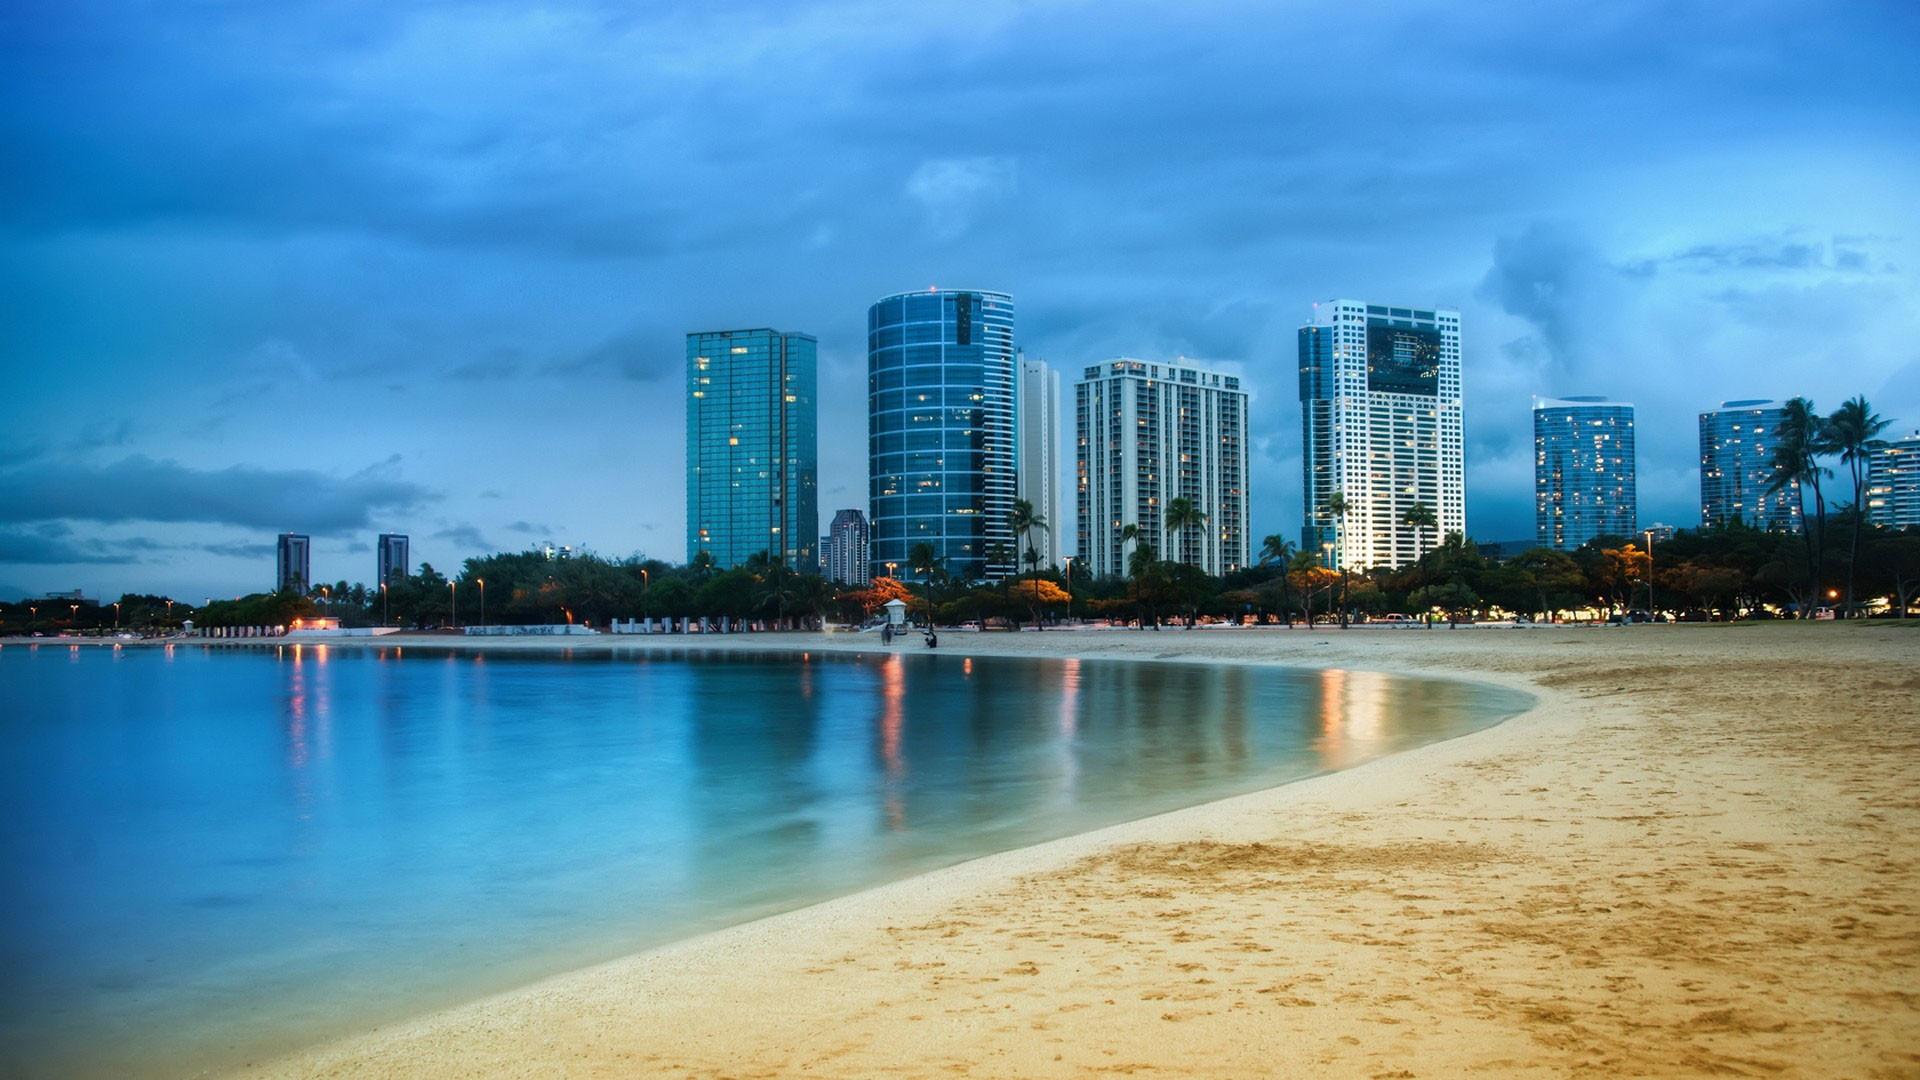 hd pics photos stunning attractive miami beach 19 hd desktop background  wallpaper